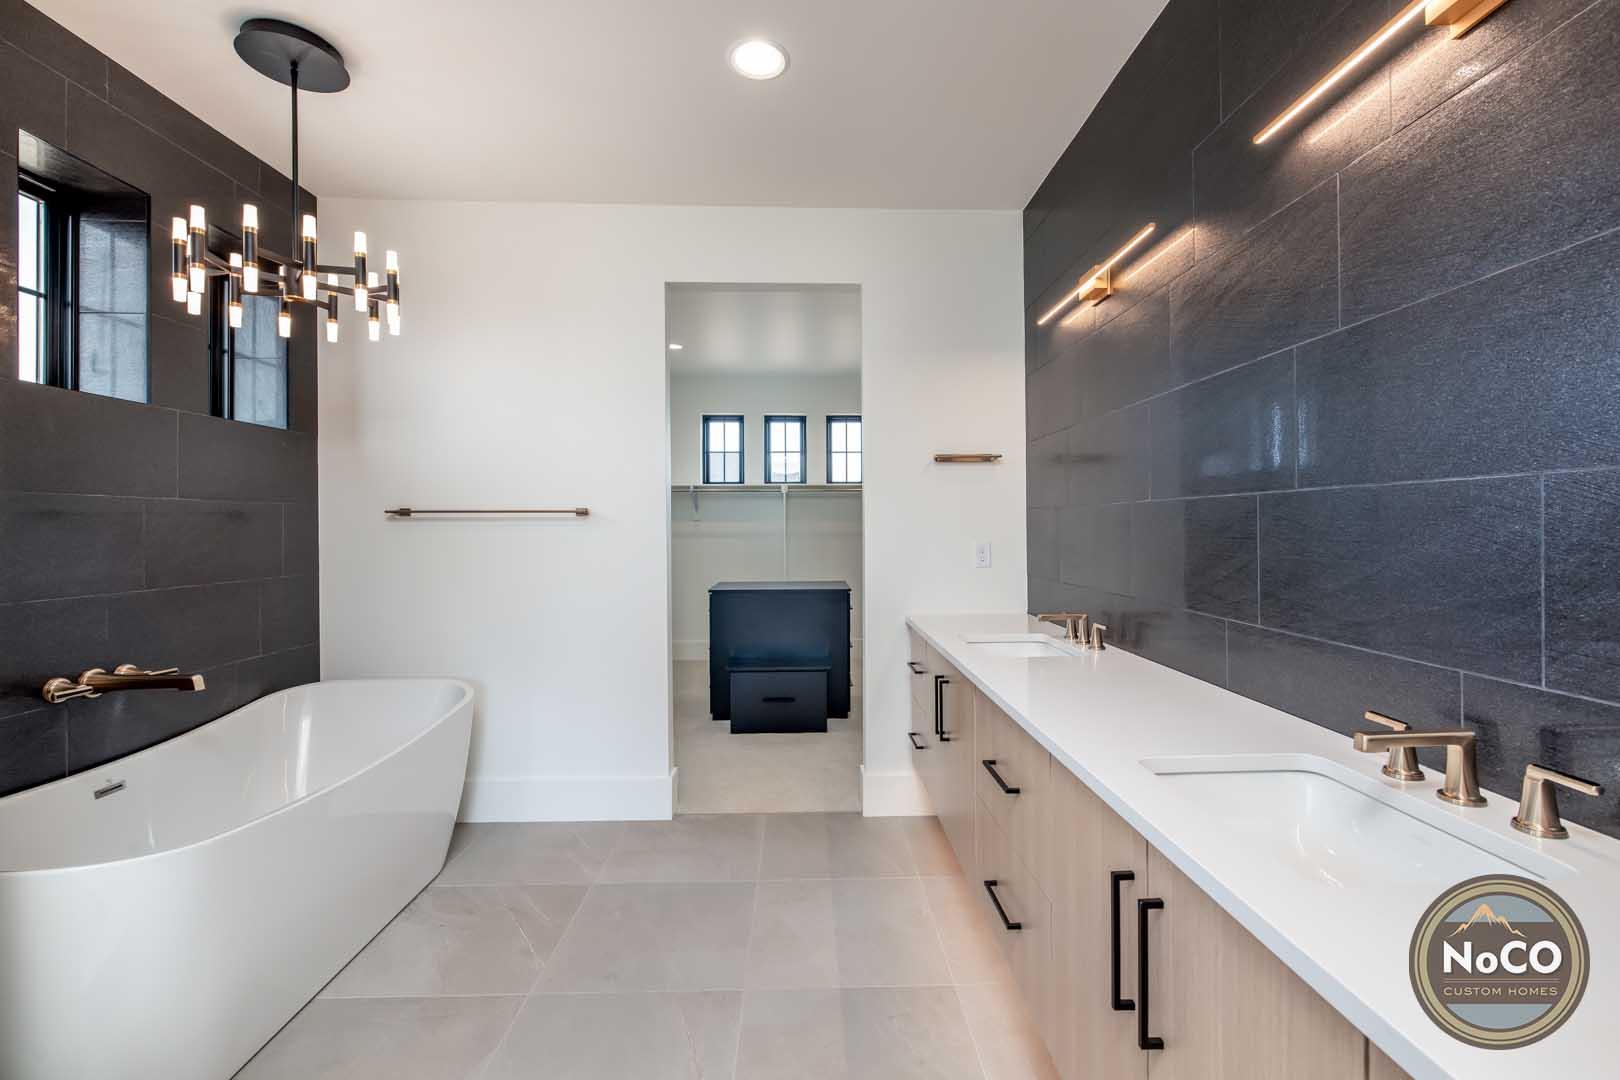 colorado custom home master bathroom bathtub